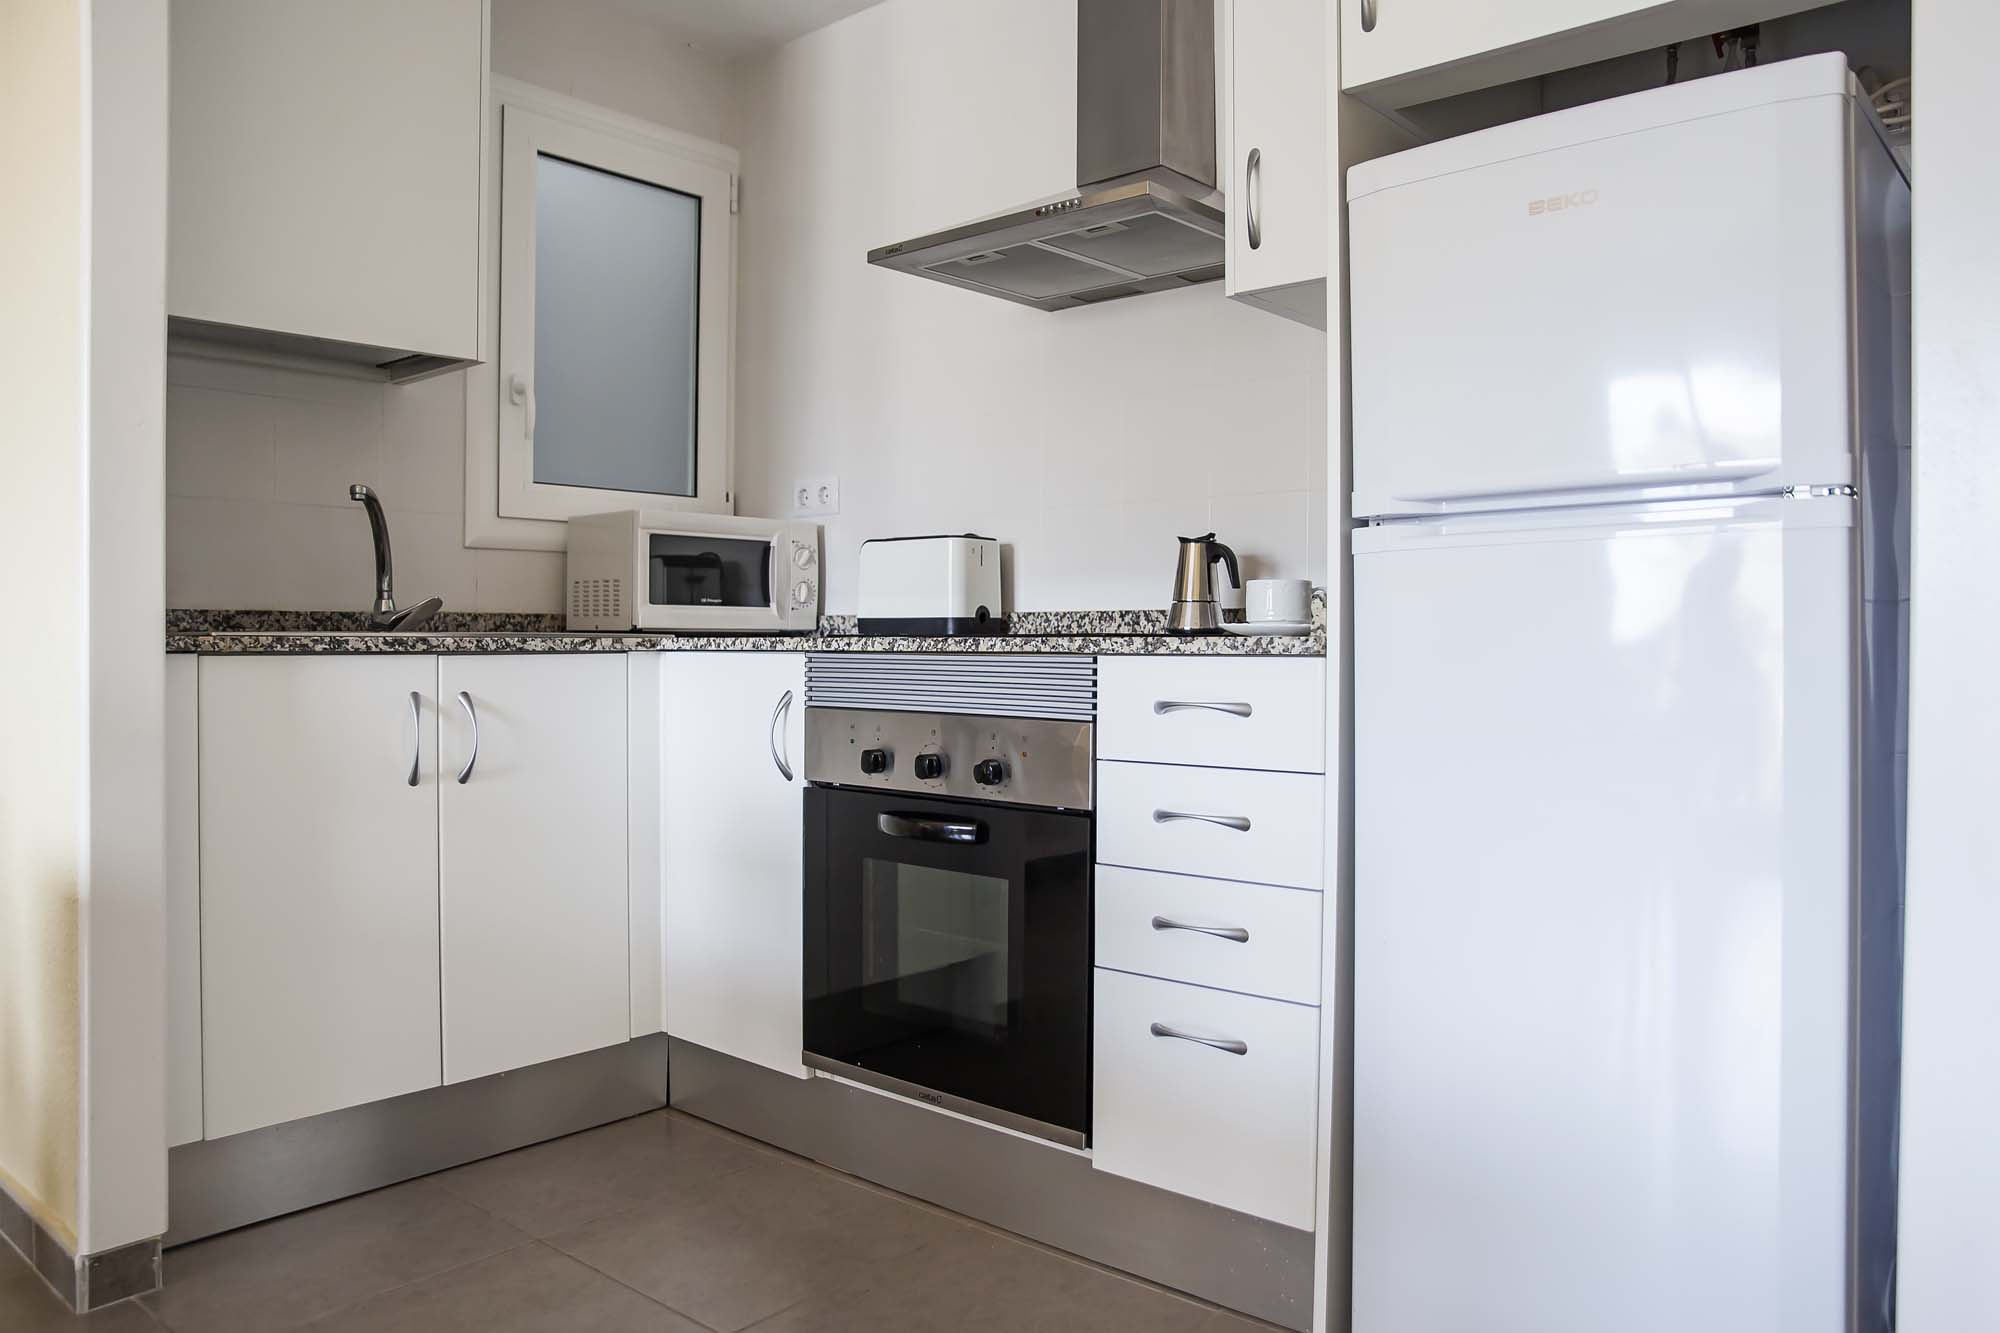 Appartements dans costa brava estartit quijote rv hotels - Apartamentos en costa brava ...